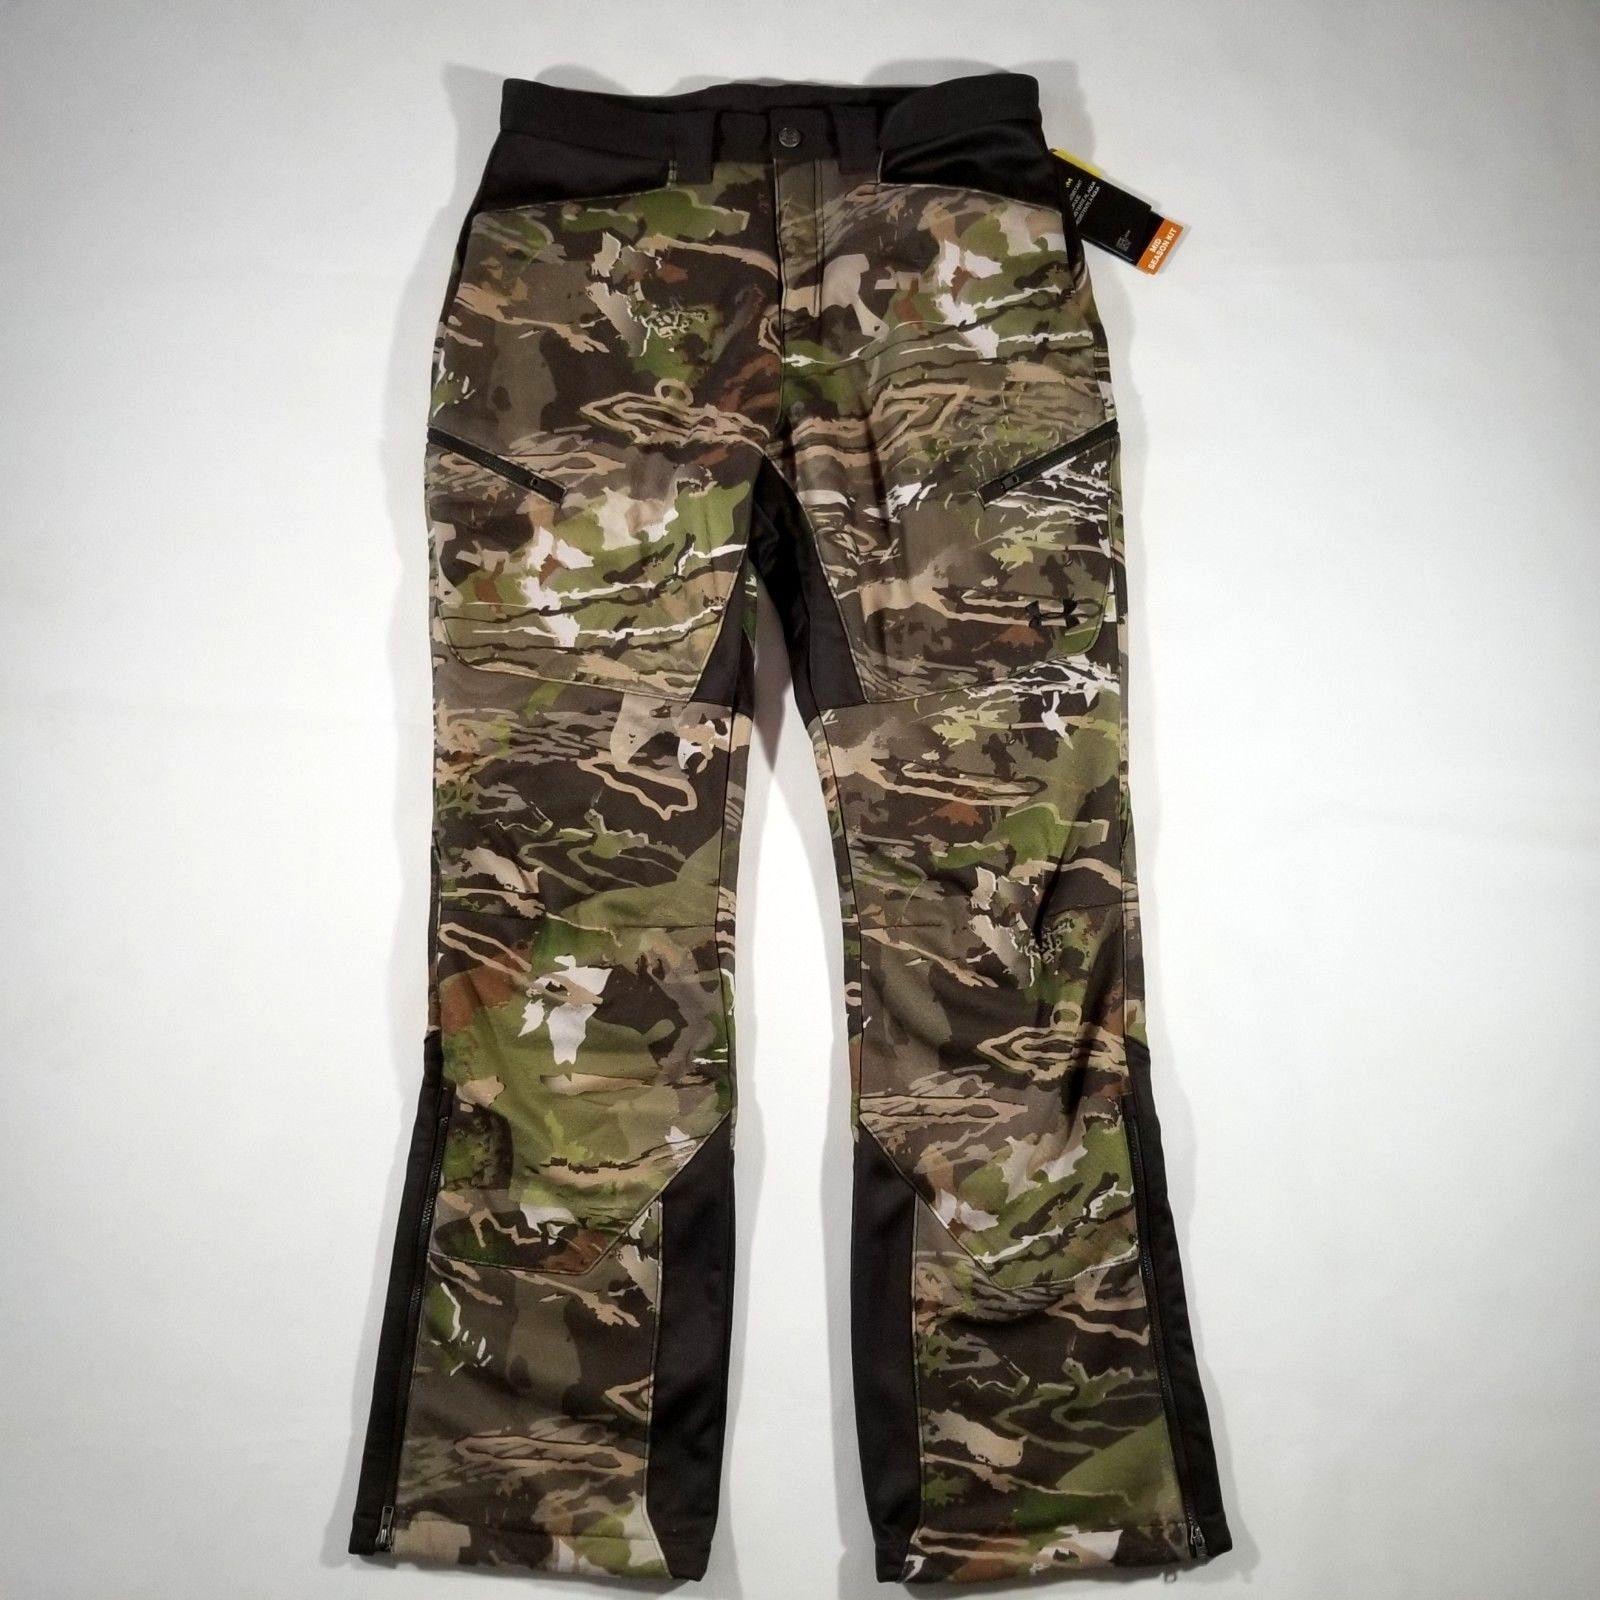 9b027c1d337ee Under Armour Stealth Fleece Hunting Pants SZ and 17 similar items. 57